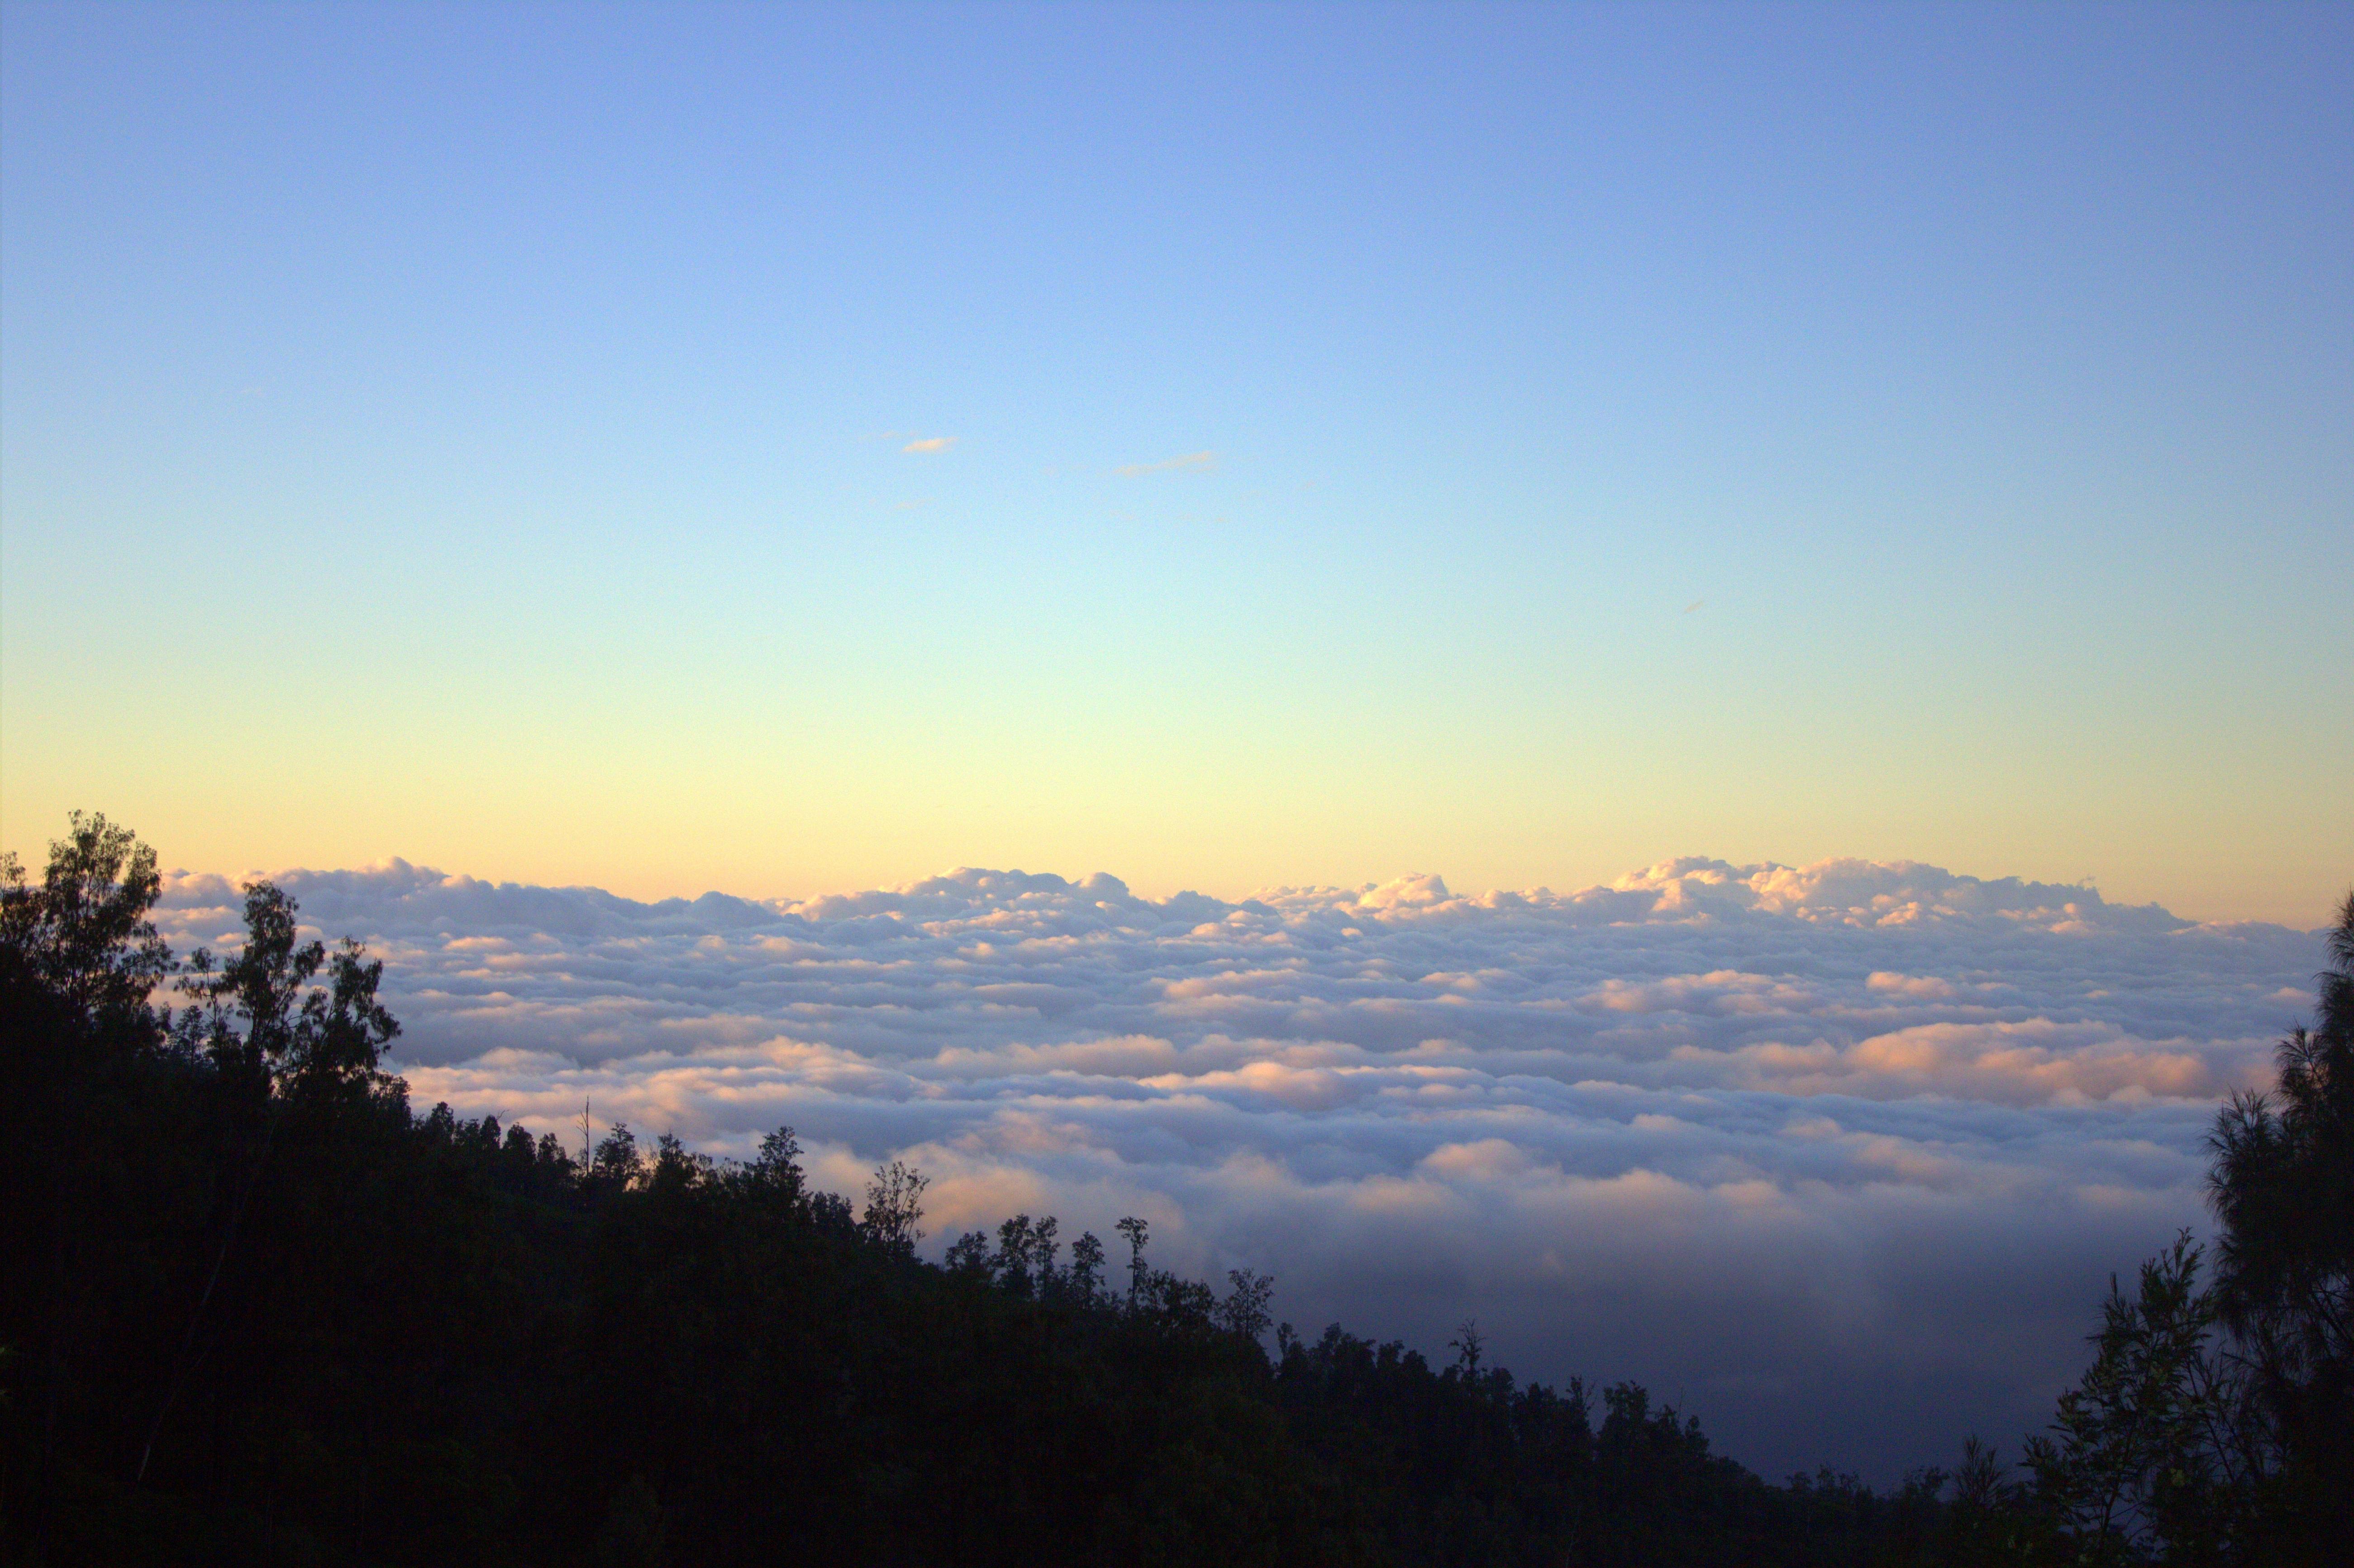 Cloud beds